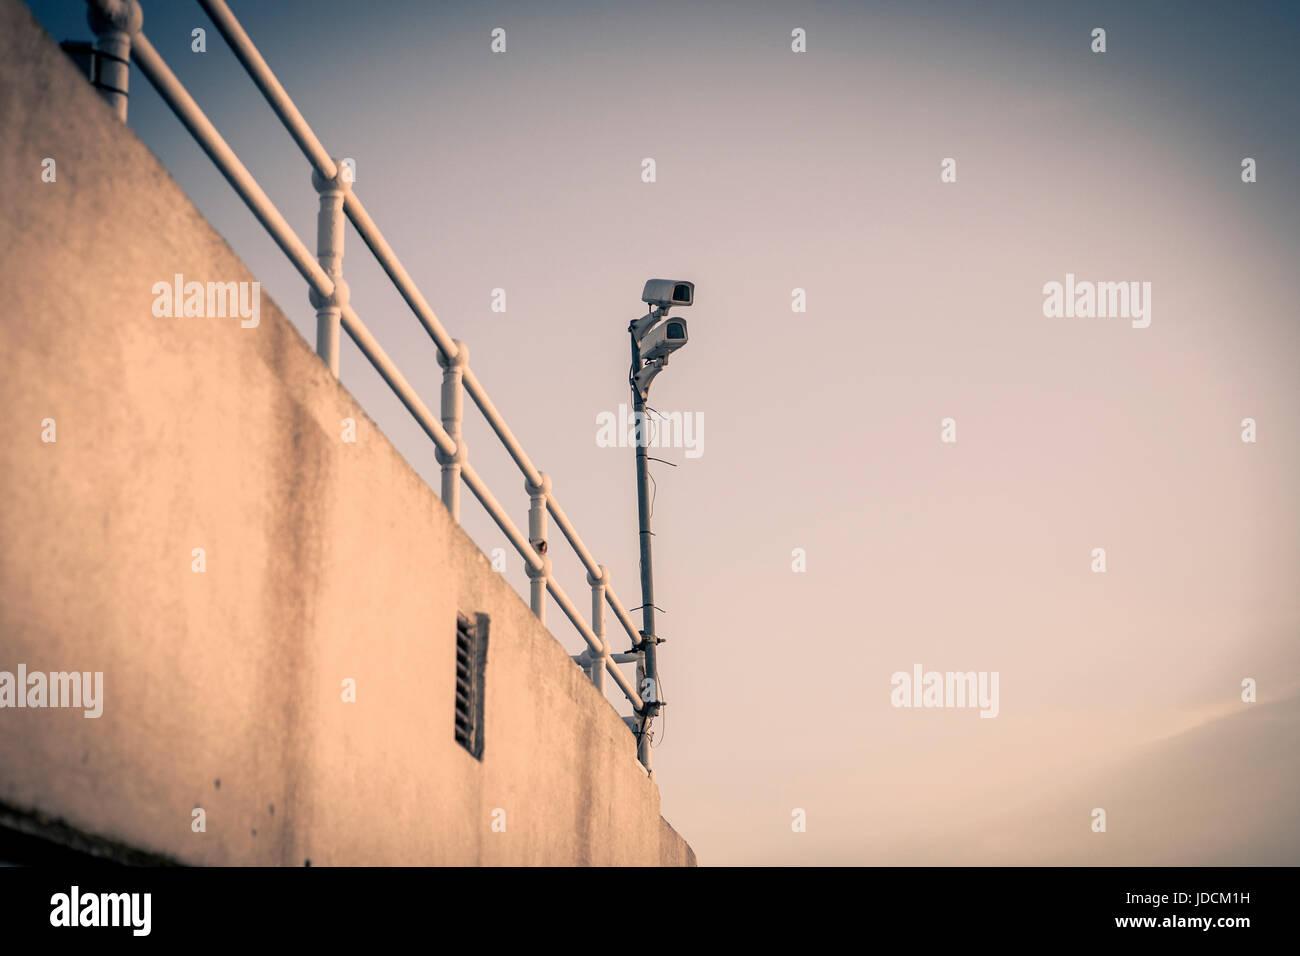 CCTV Security Surveillance Camera - Stock Image